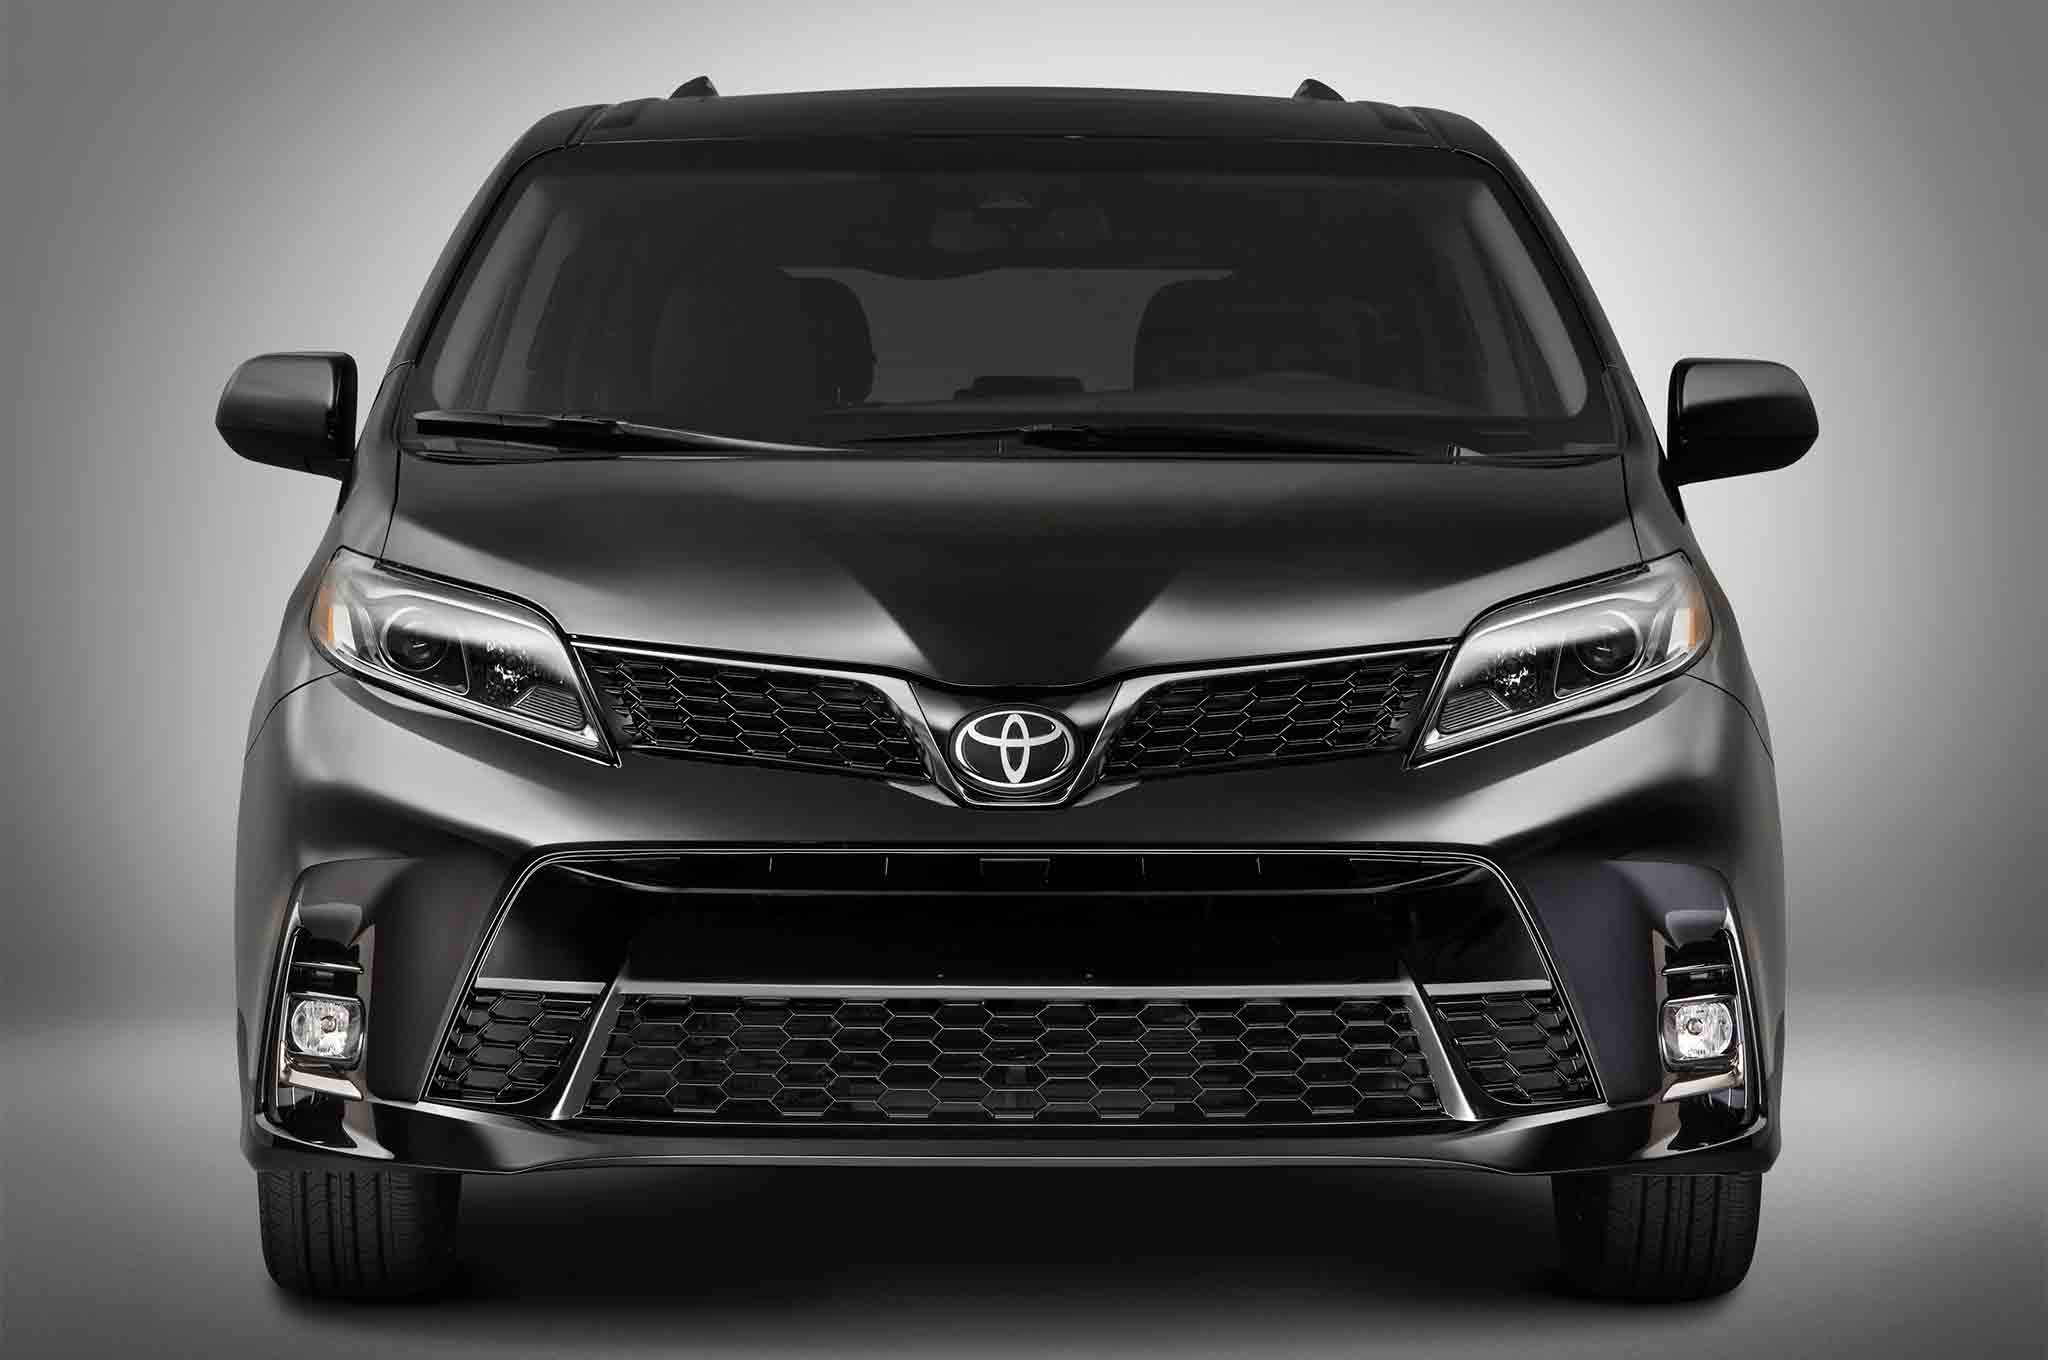 New Honda Odyssey >> 2018 Toyota Sienna Receives a Fresh Look | Automobile Magazine